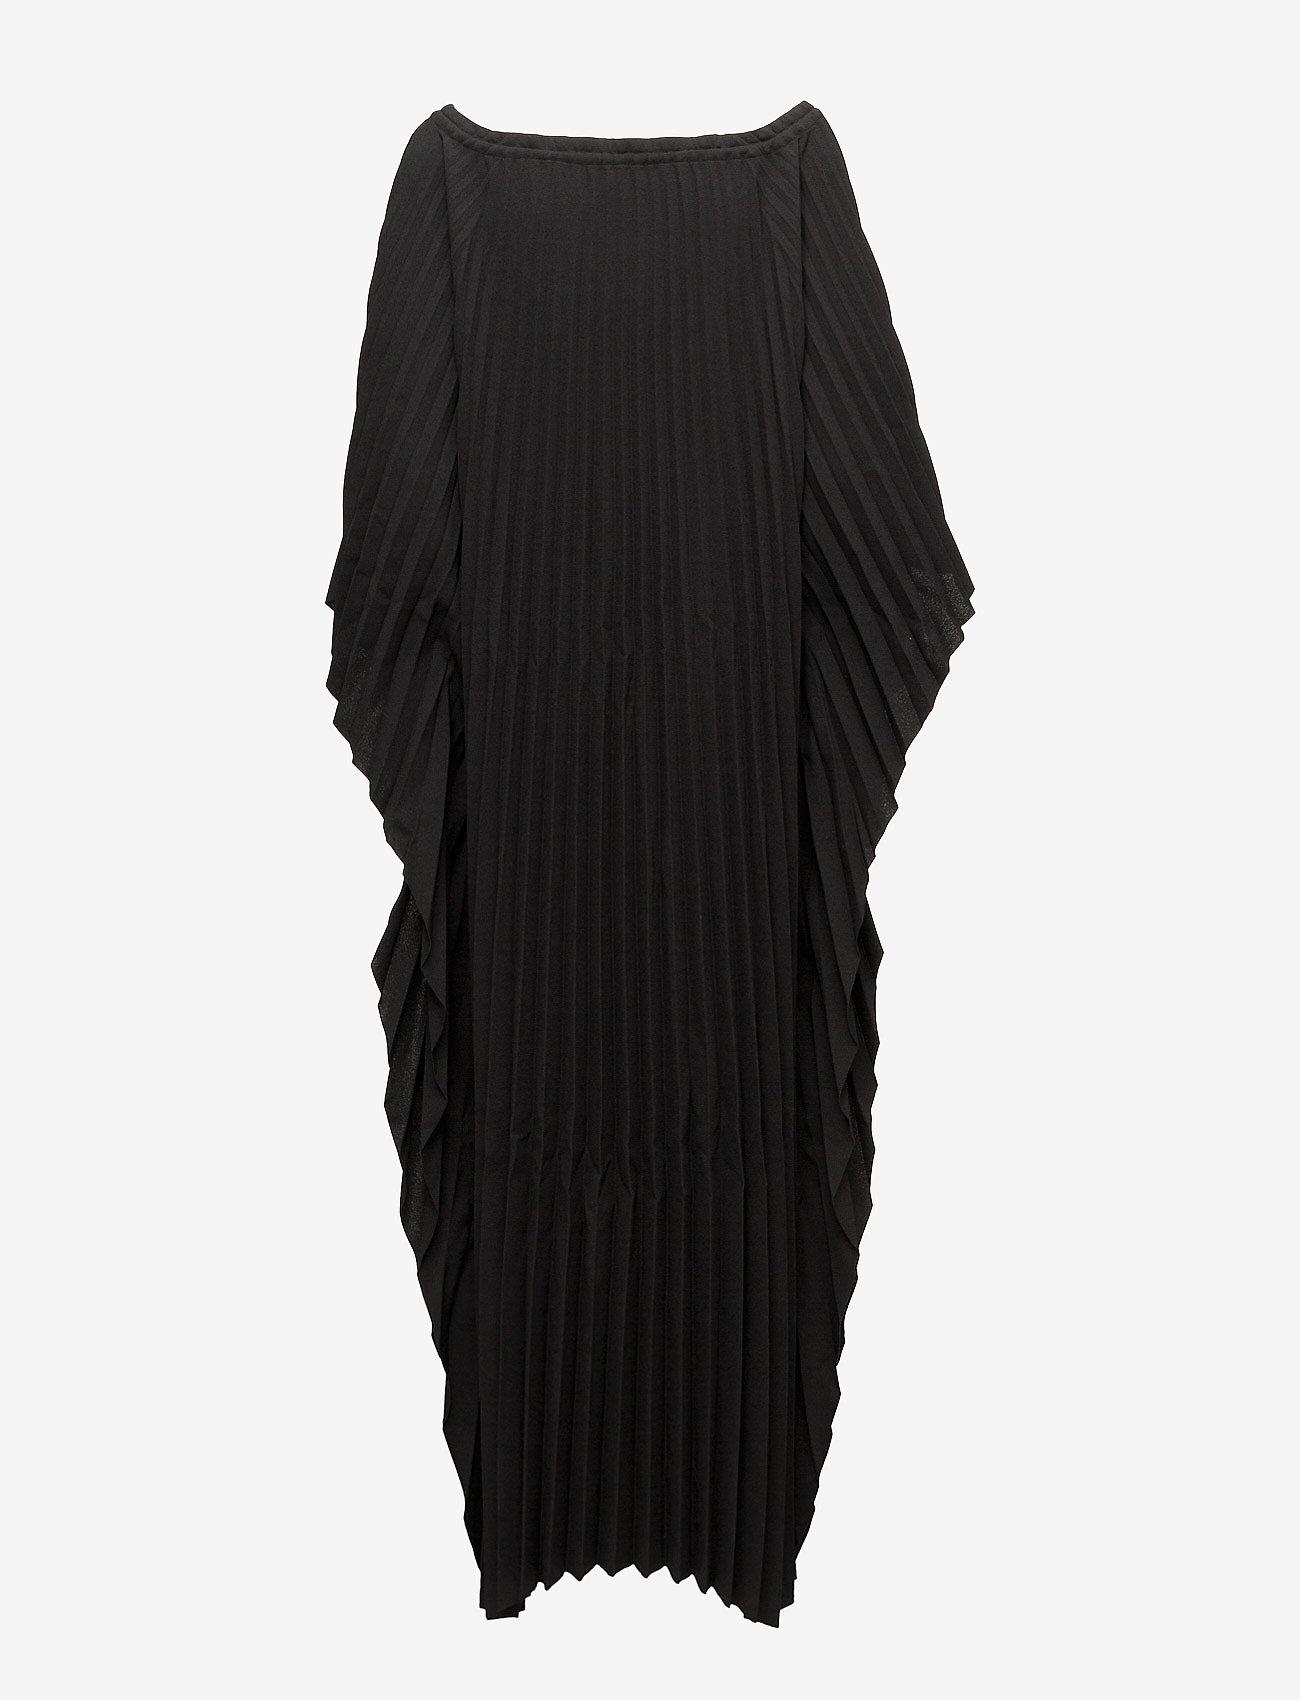 Poncho Plise Dress (Black) (297.50 €) - Filippa K 6gQR6